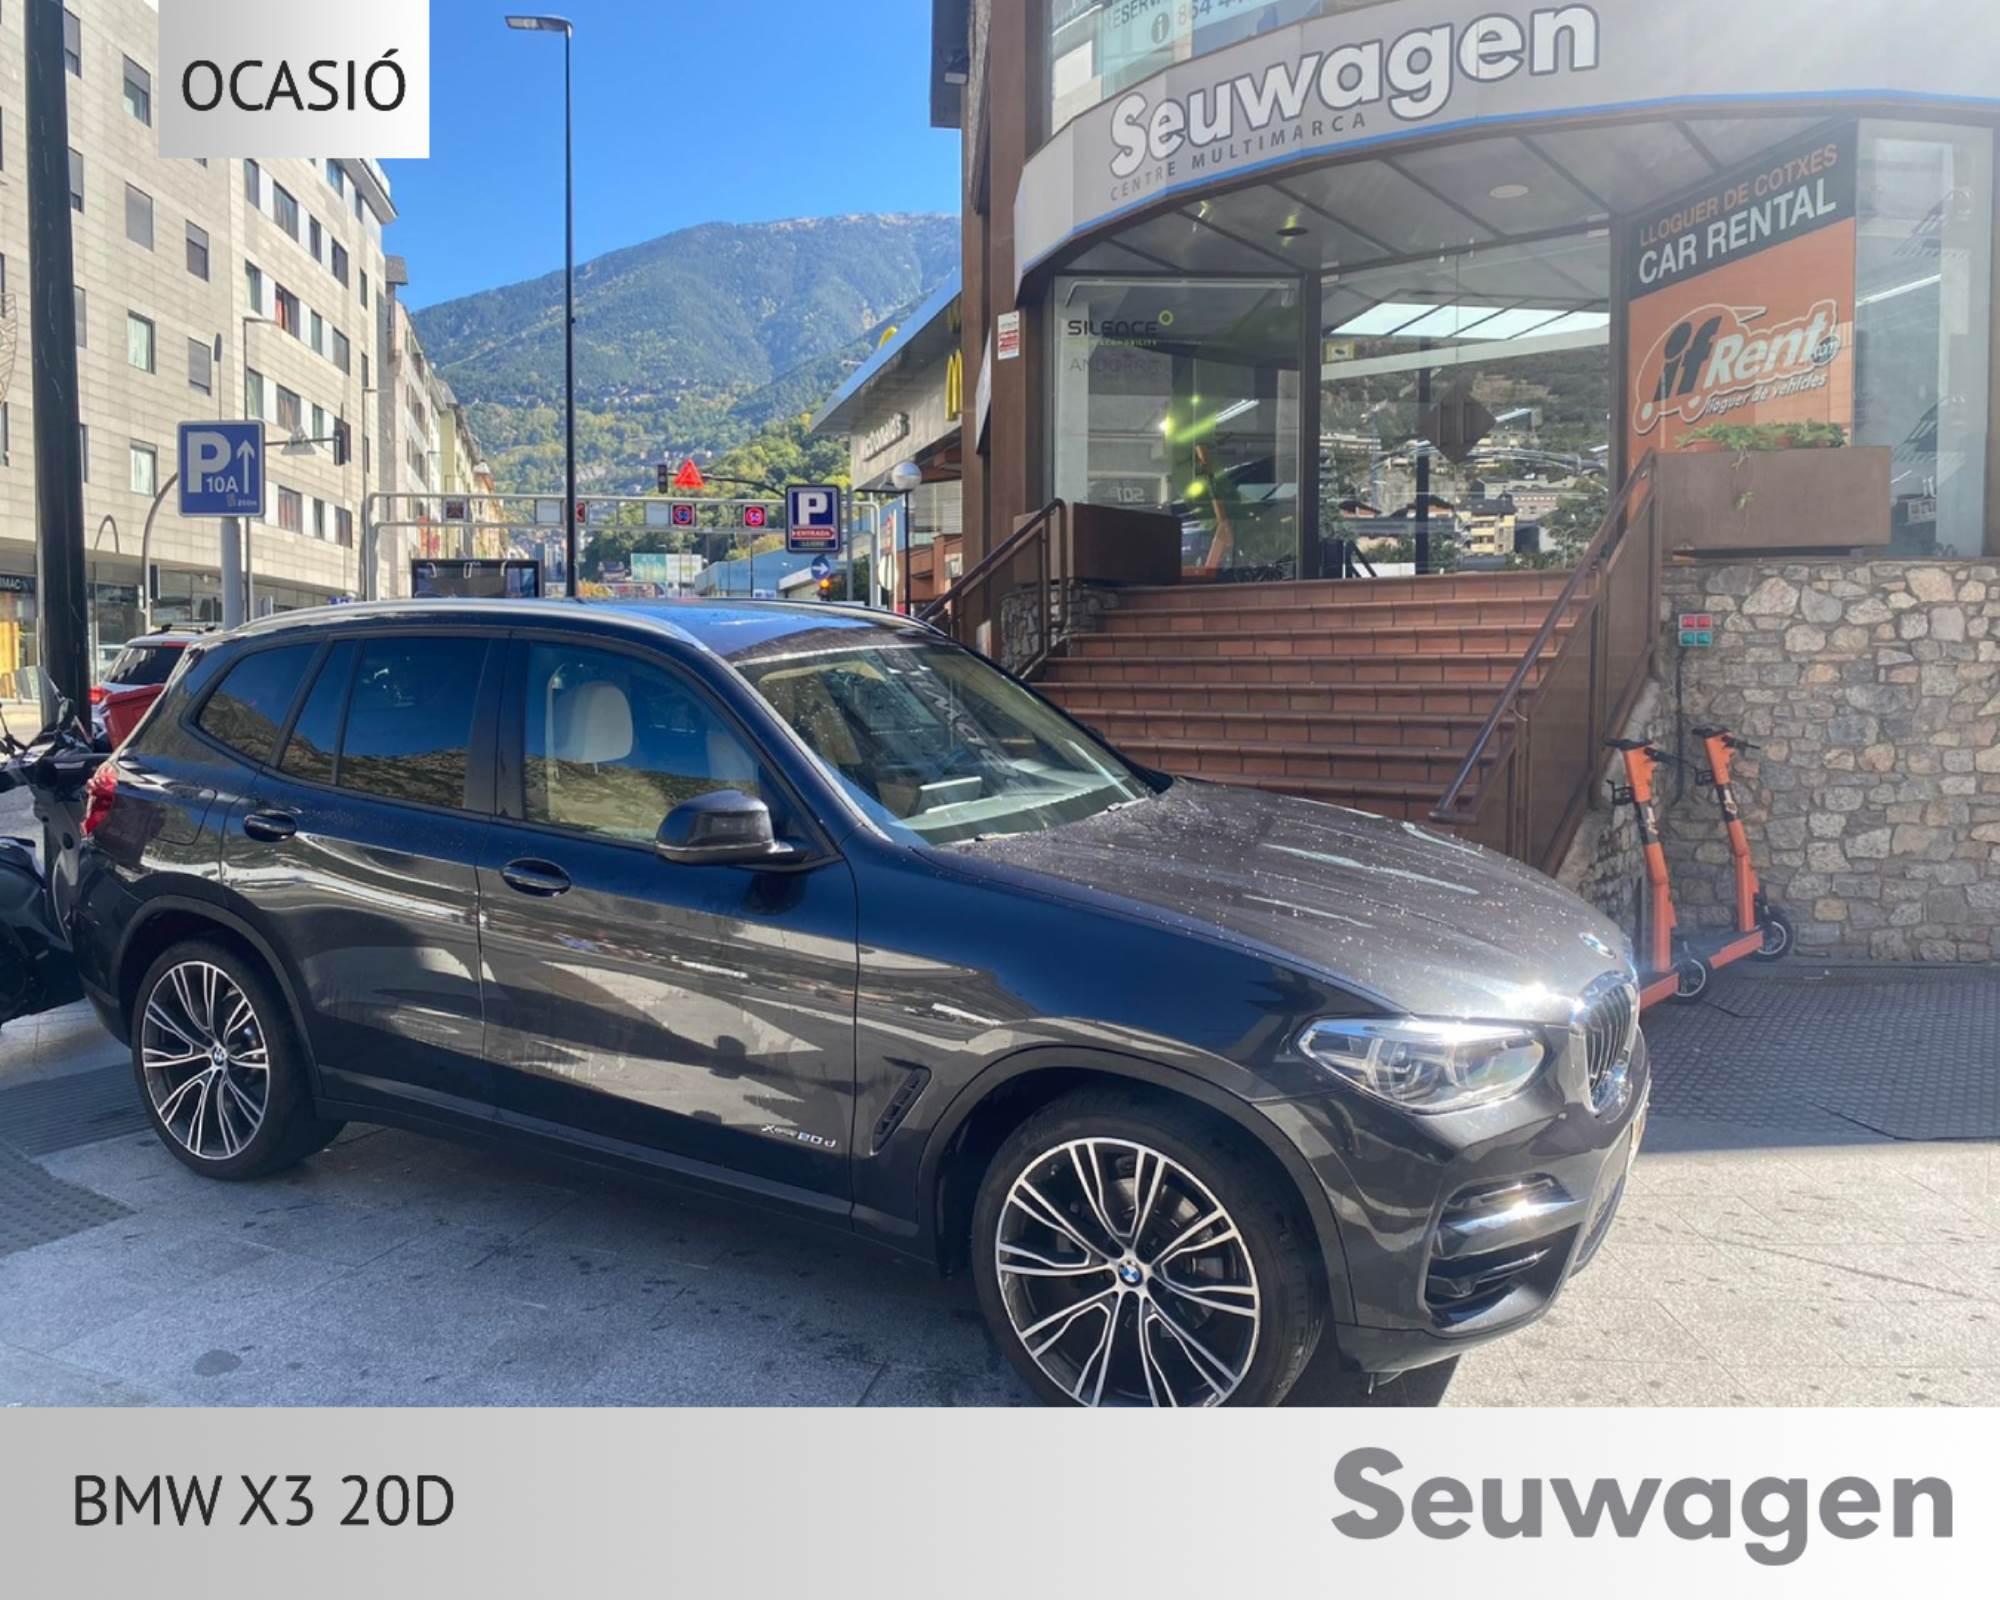 BMW - X3 - Xdrive 20D Xdrive 20D Dièsel  2017  85.000 Km